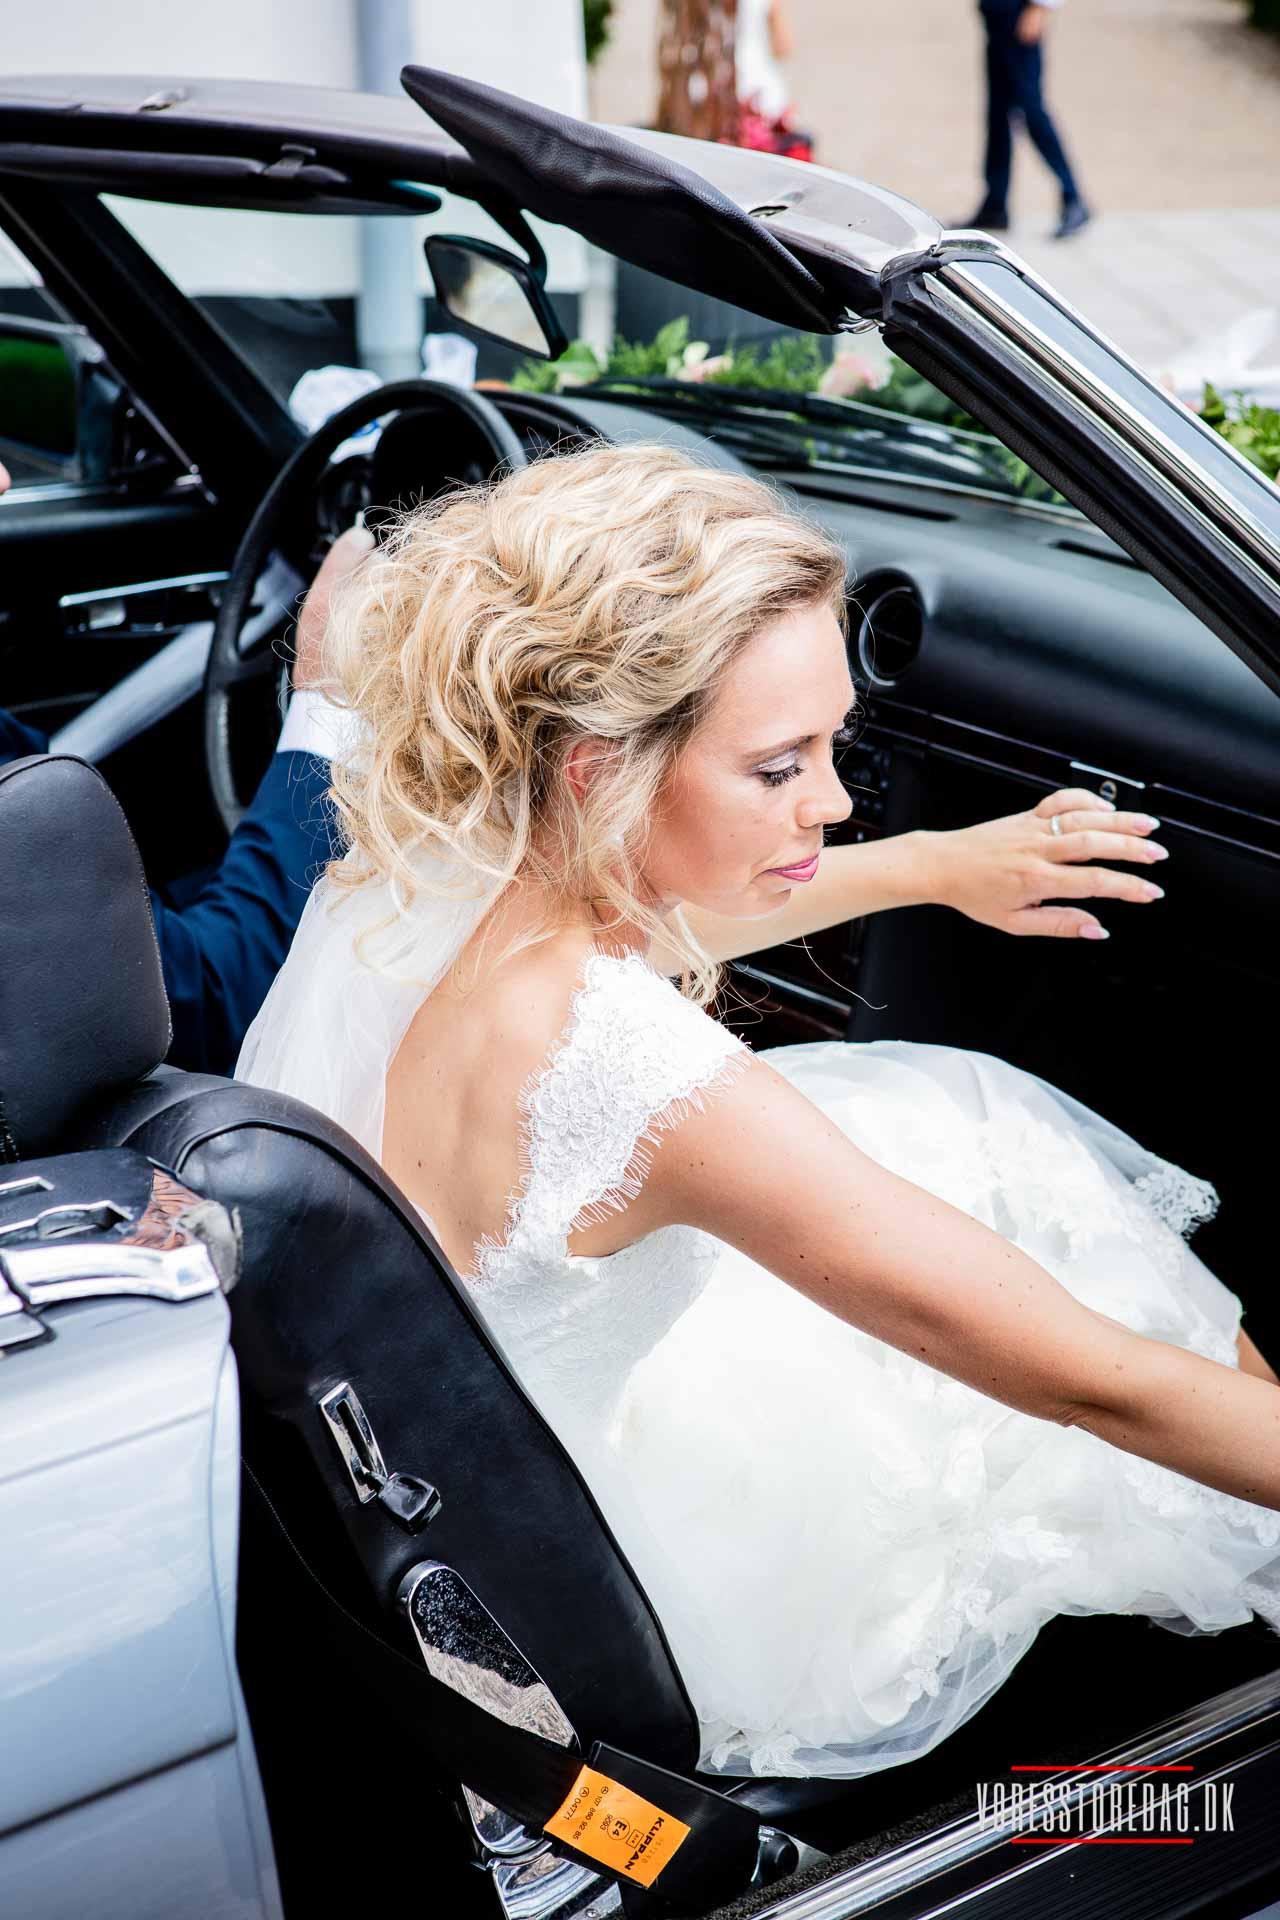 Tyrstrup kro bryllup | Blandet | Bryllupsdetaljer, Bryllup